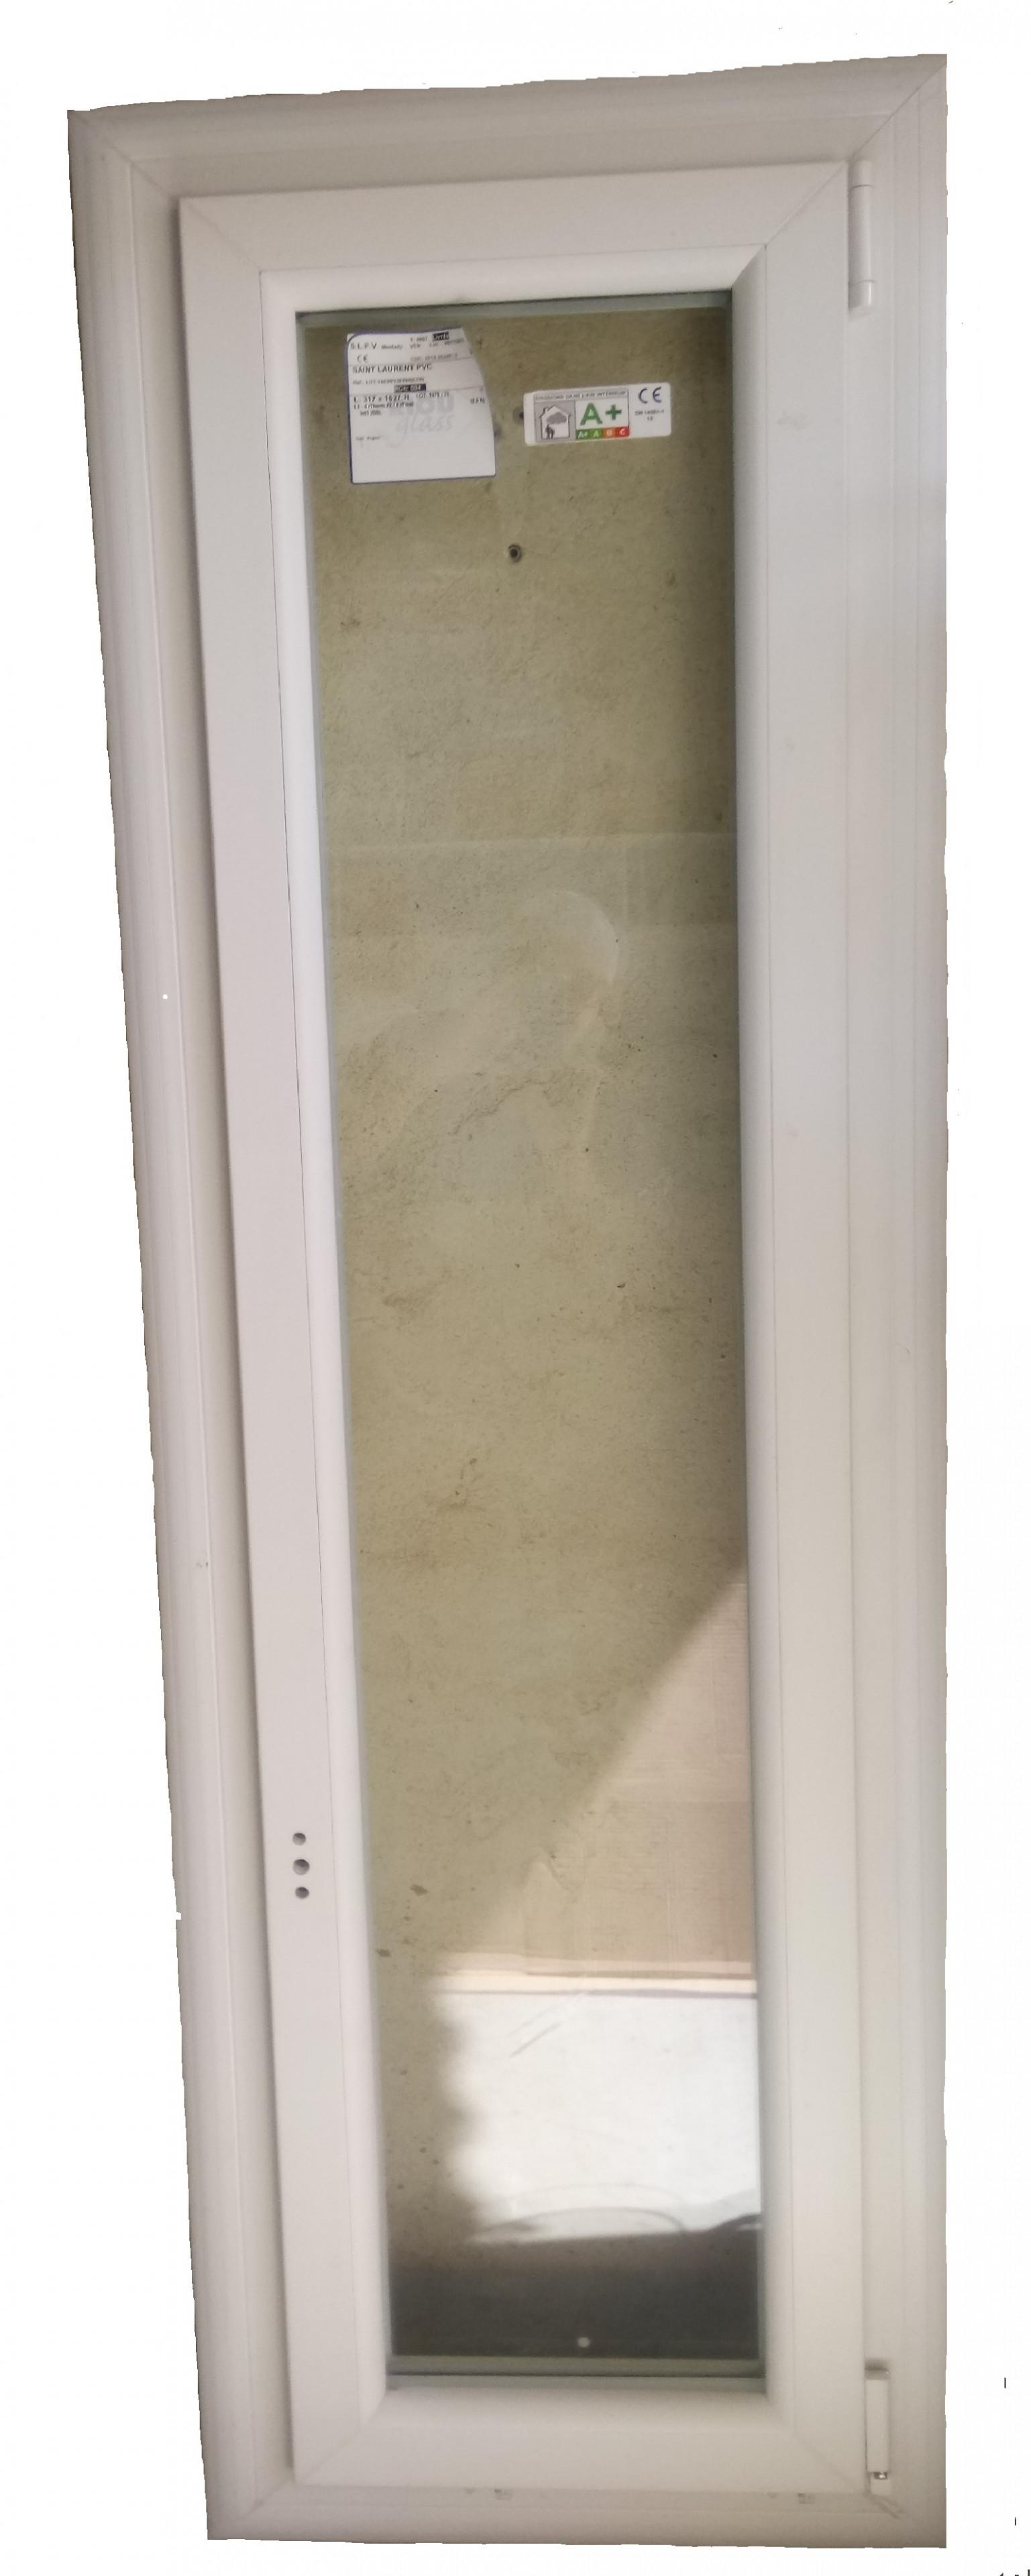 Fenêtre PVC 1 vantail oscillo-battant - bezin